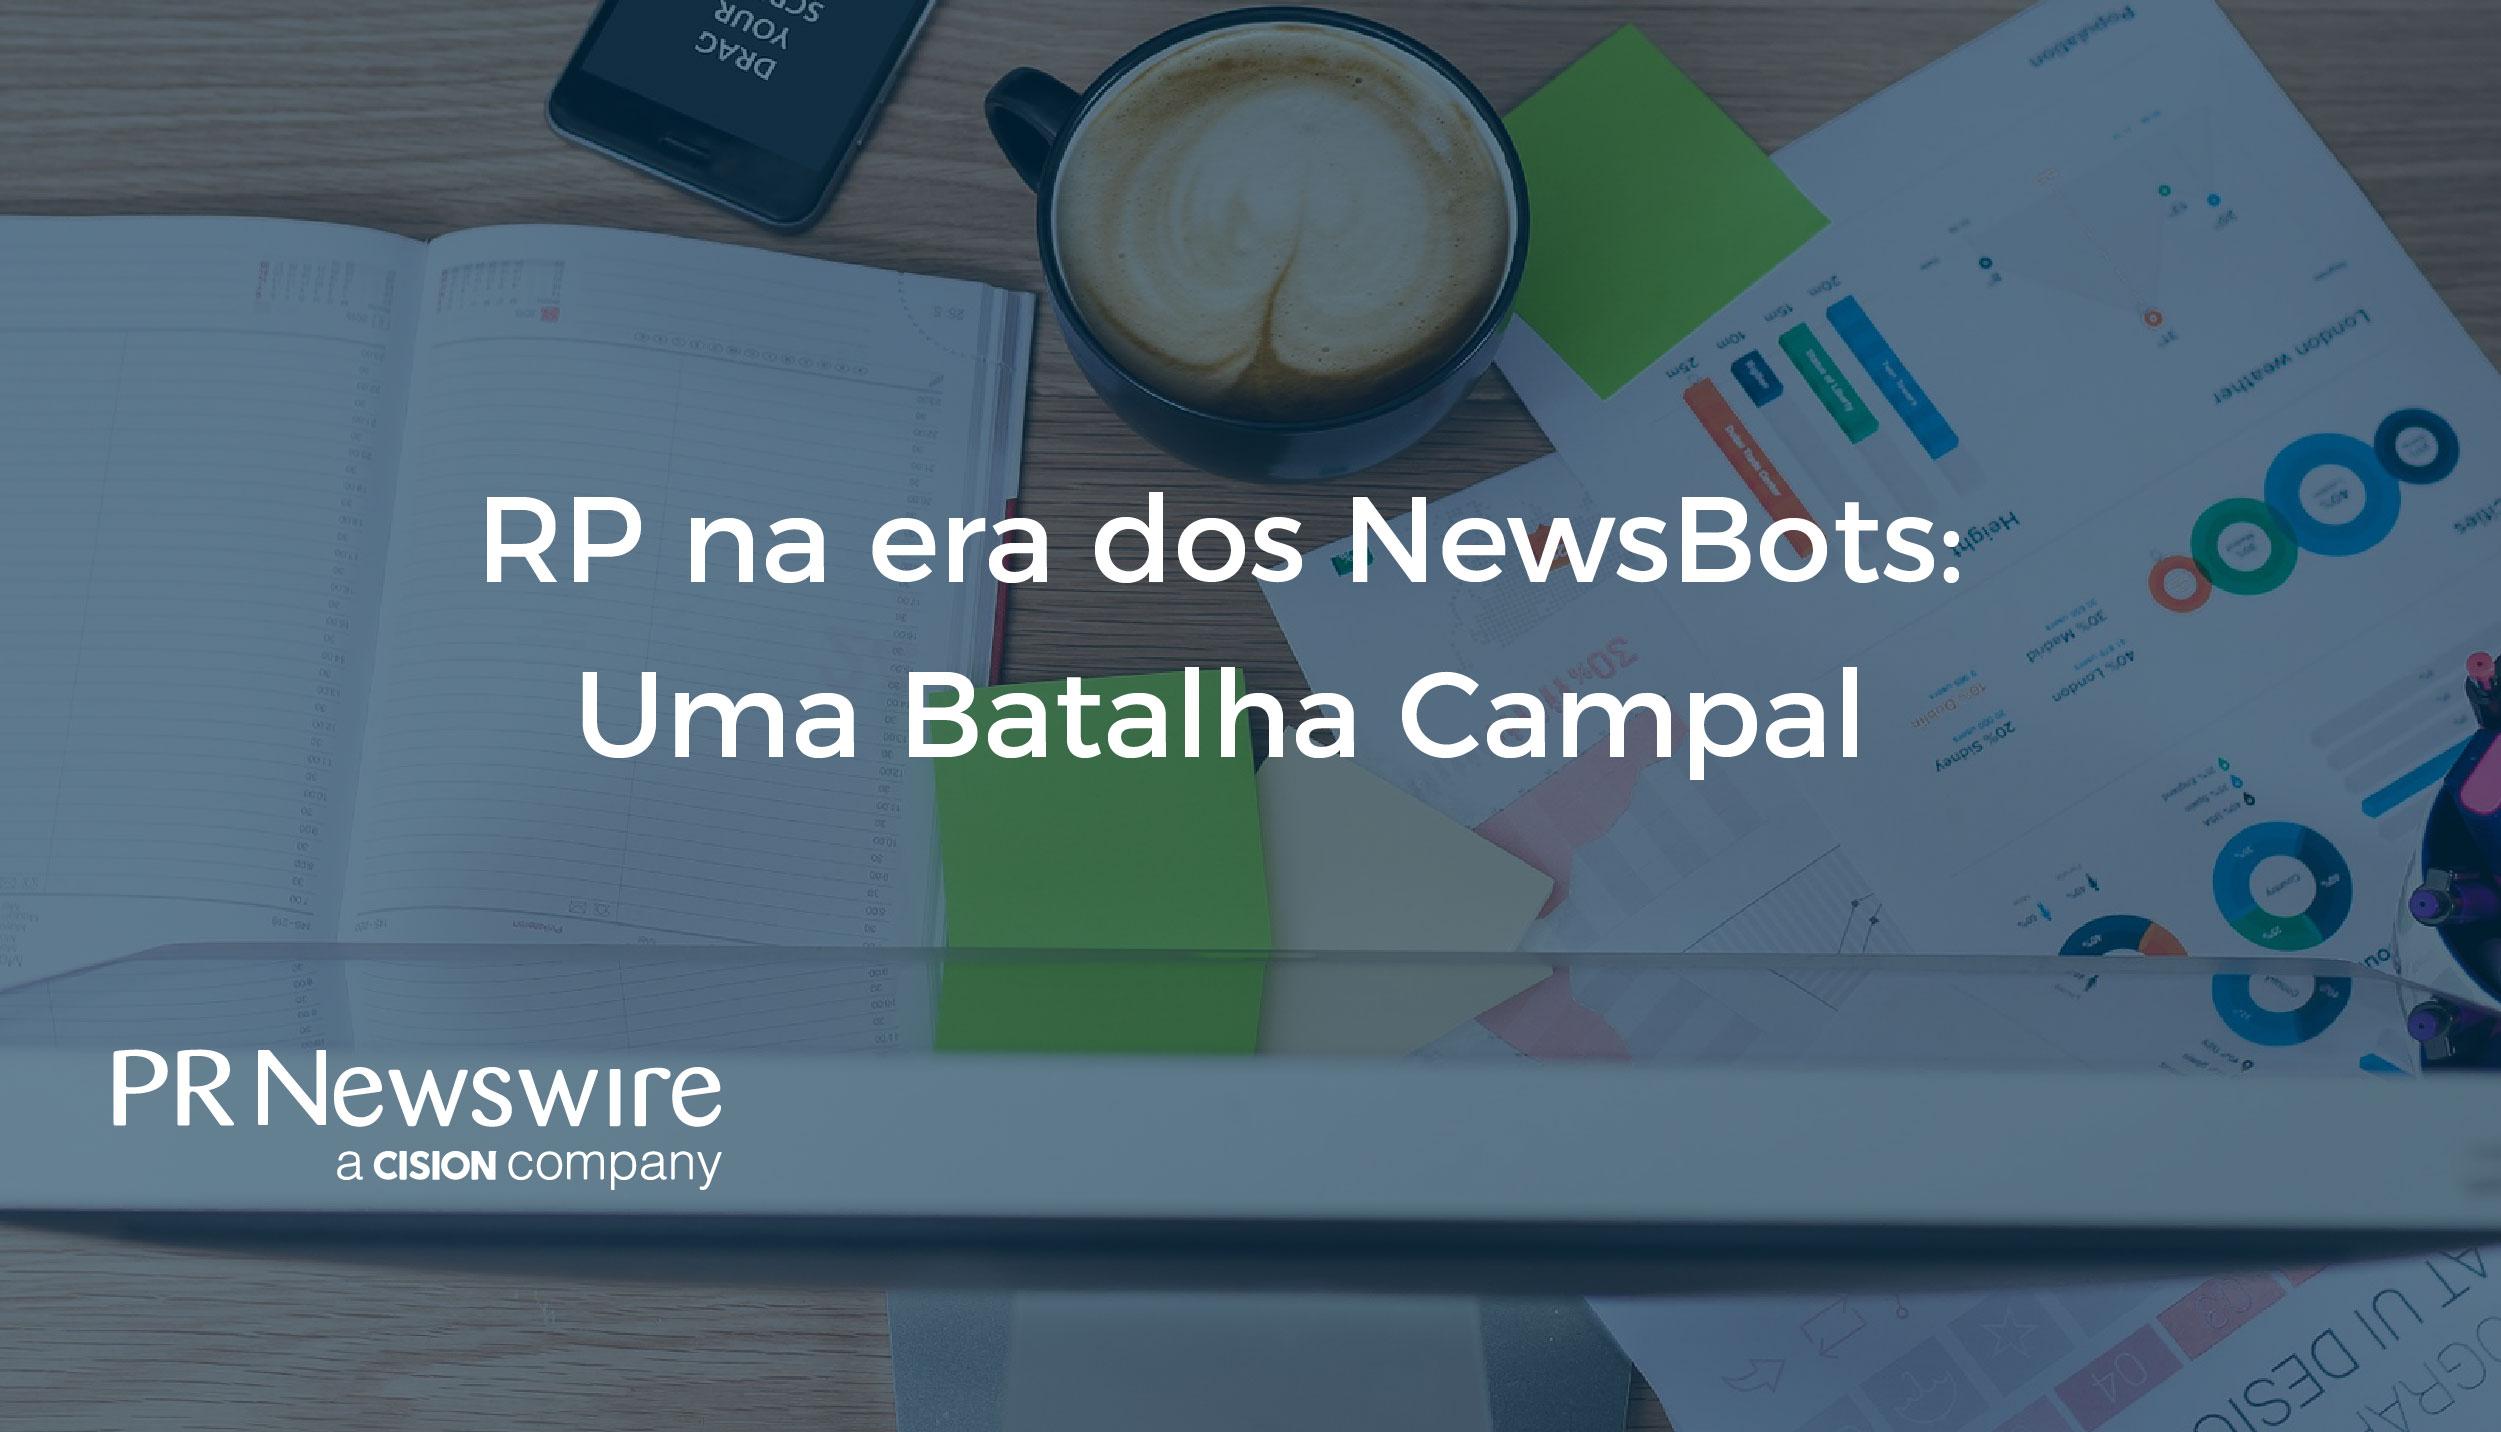 RP na era dos NewsBots